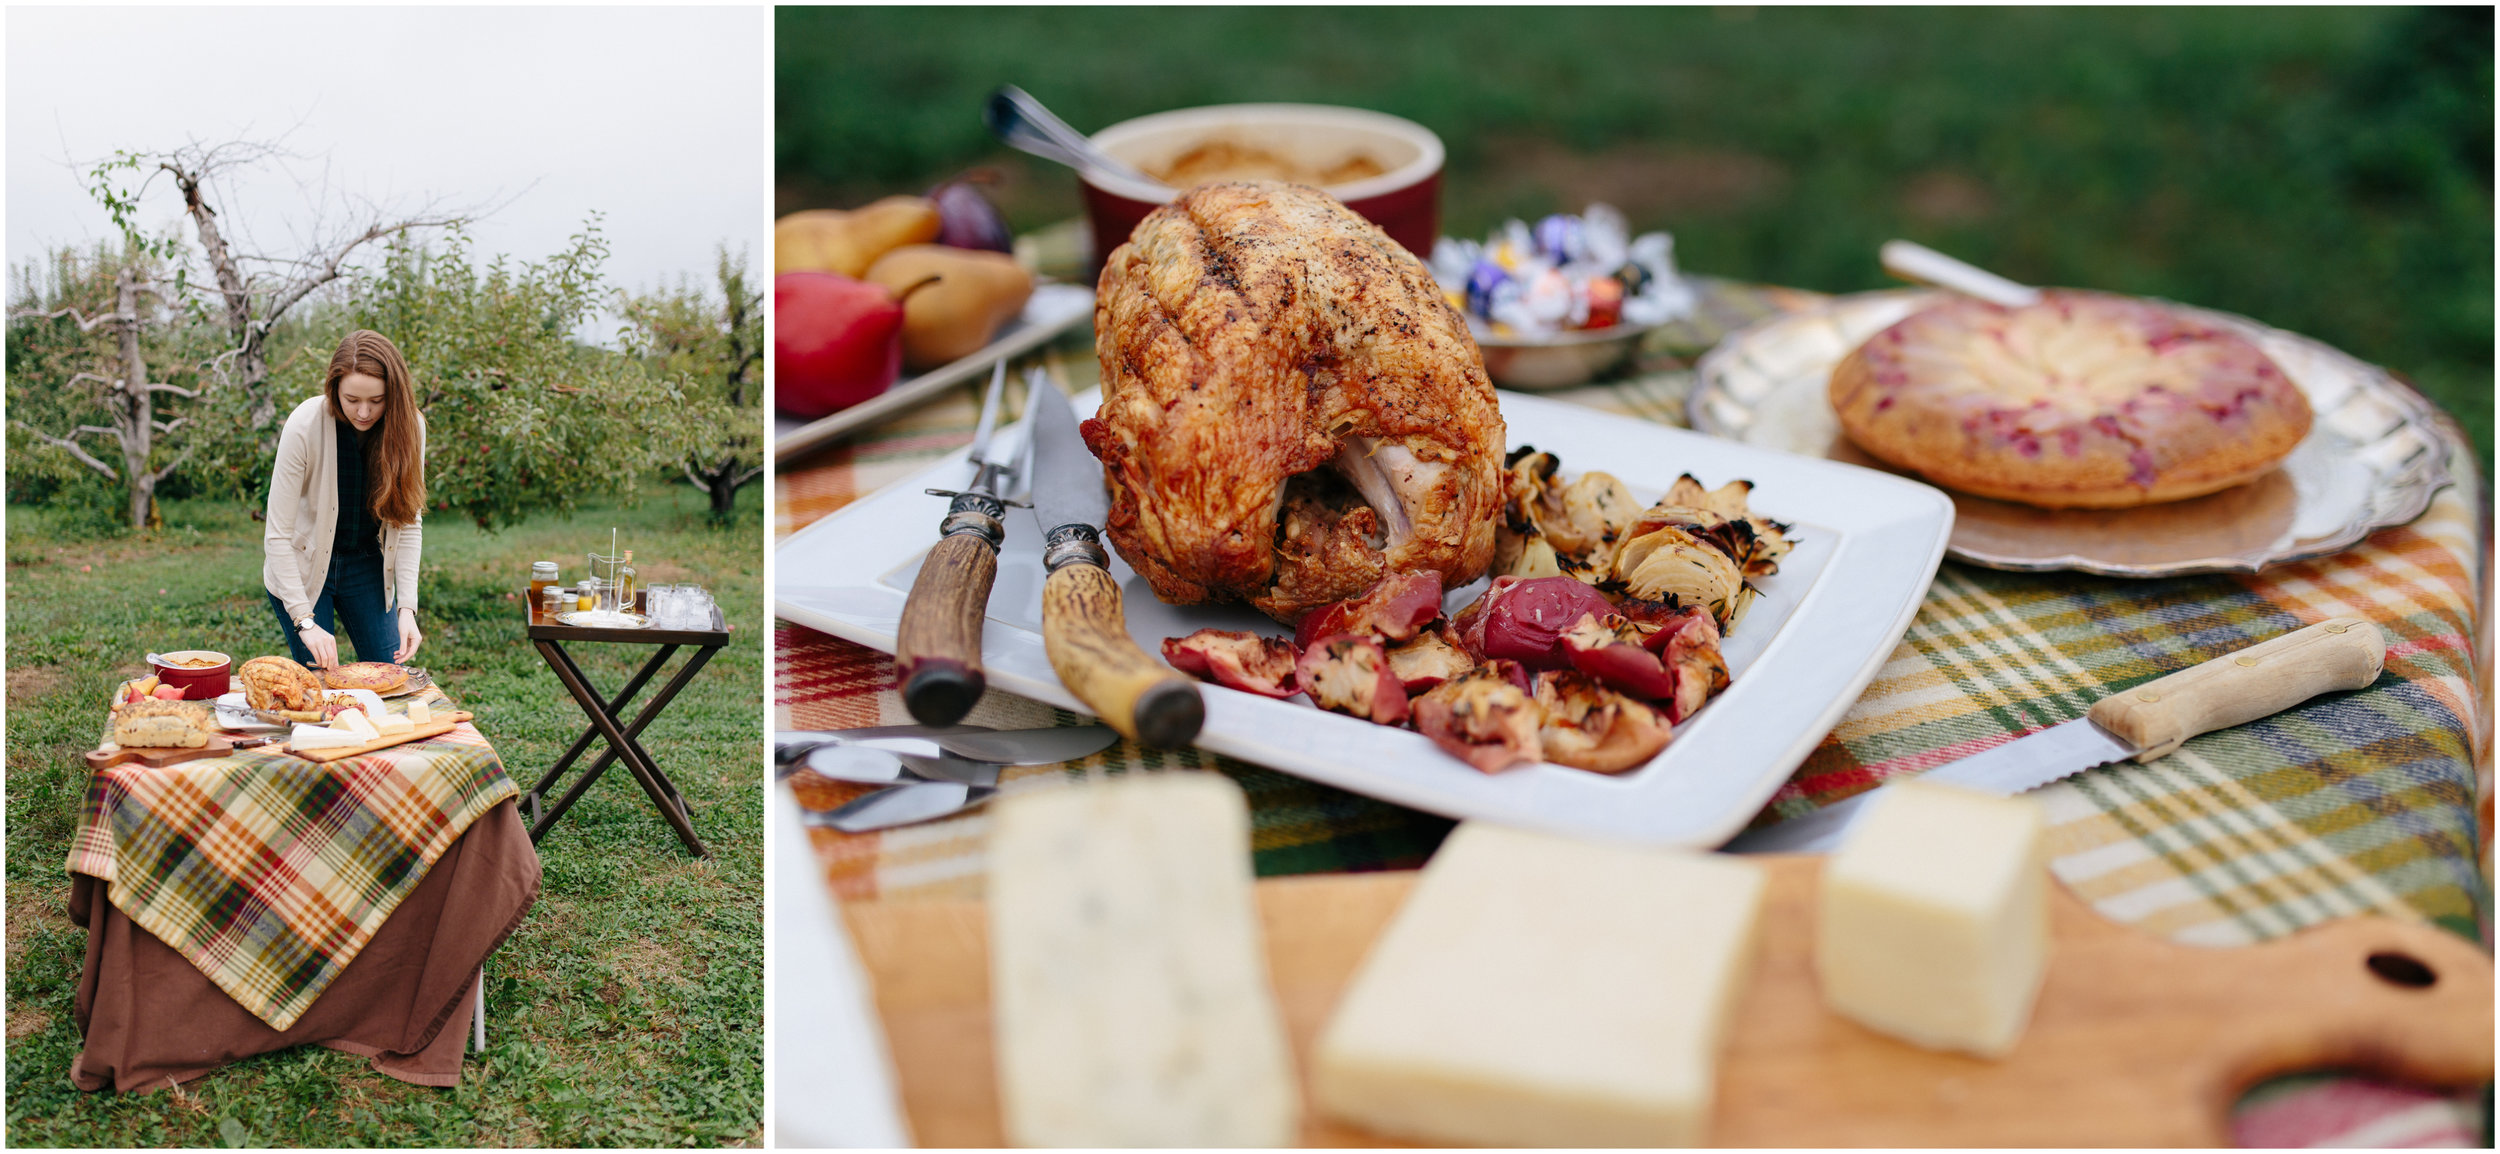 Julia Harpe makes beautiful food - chicken, apples, onions, cheese, bread